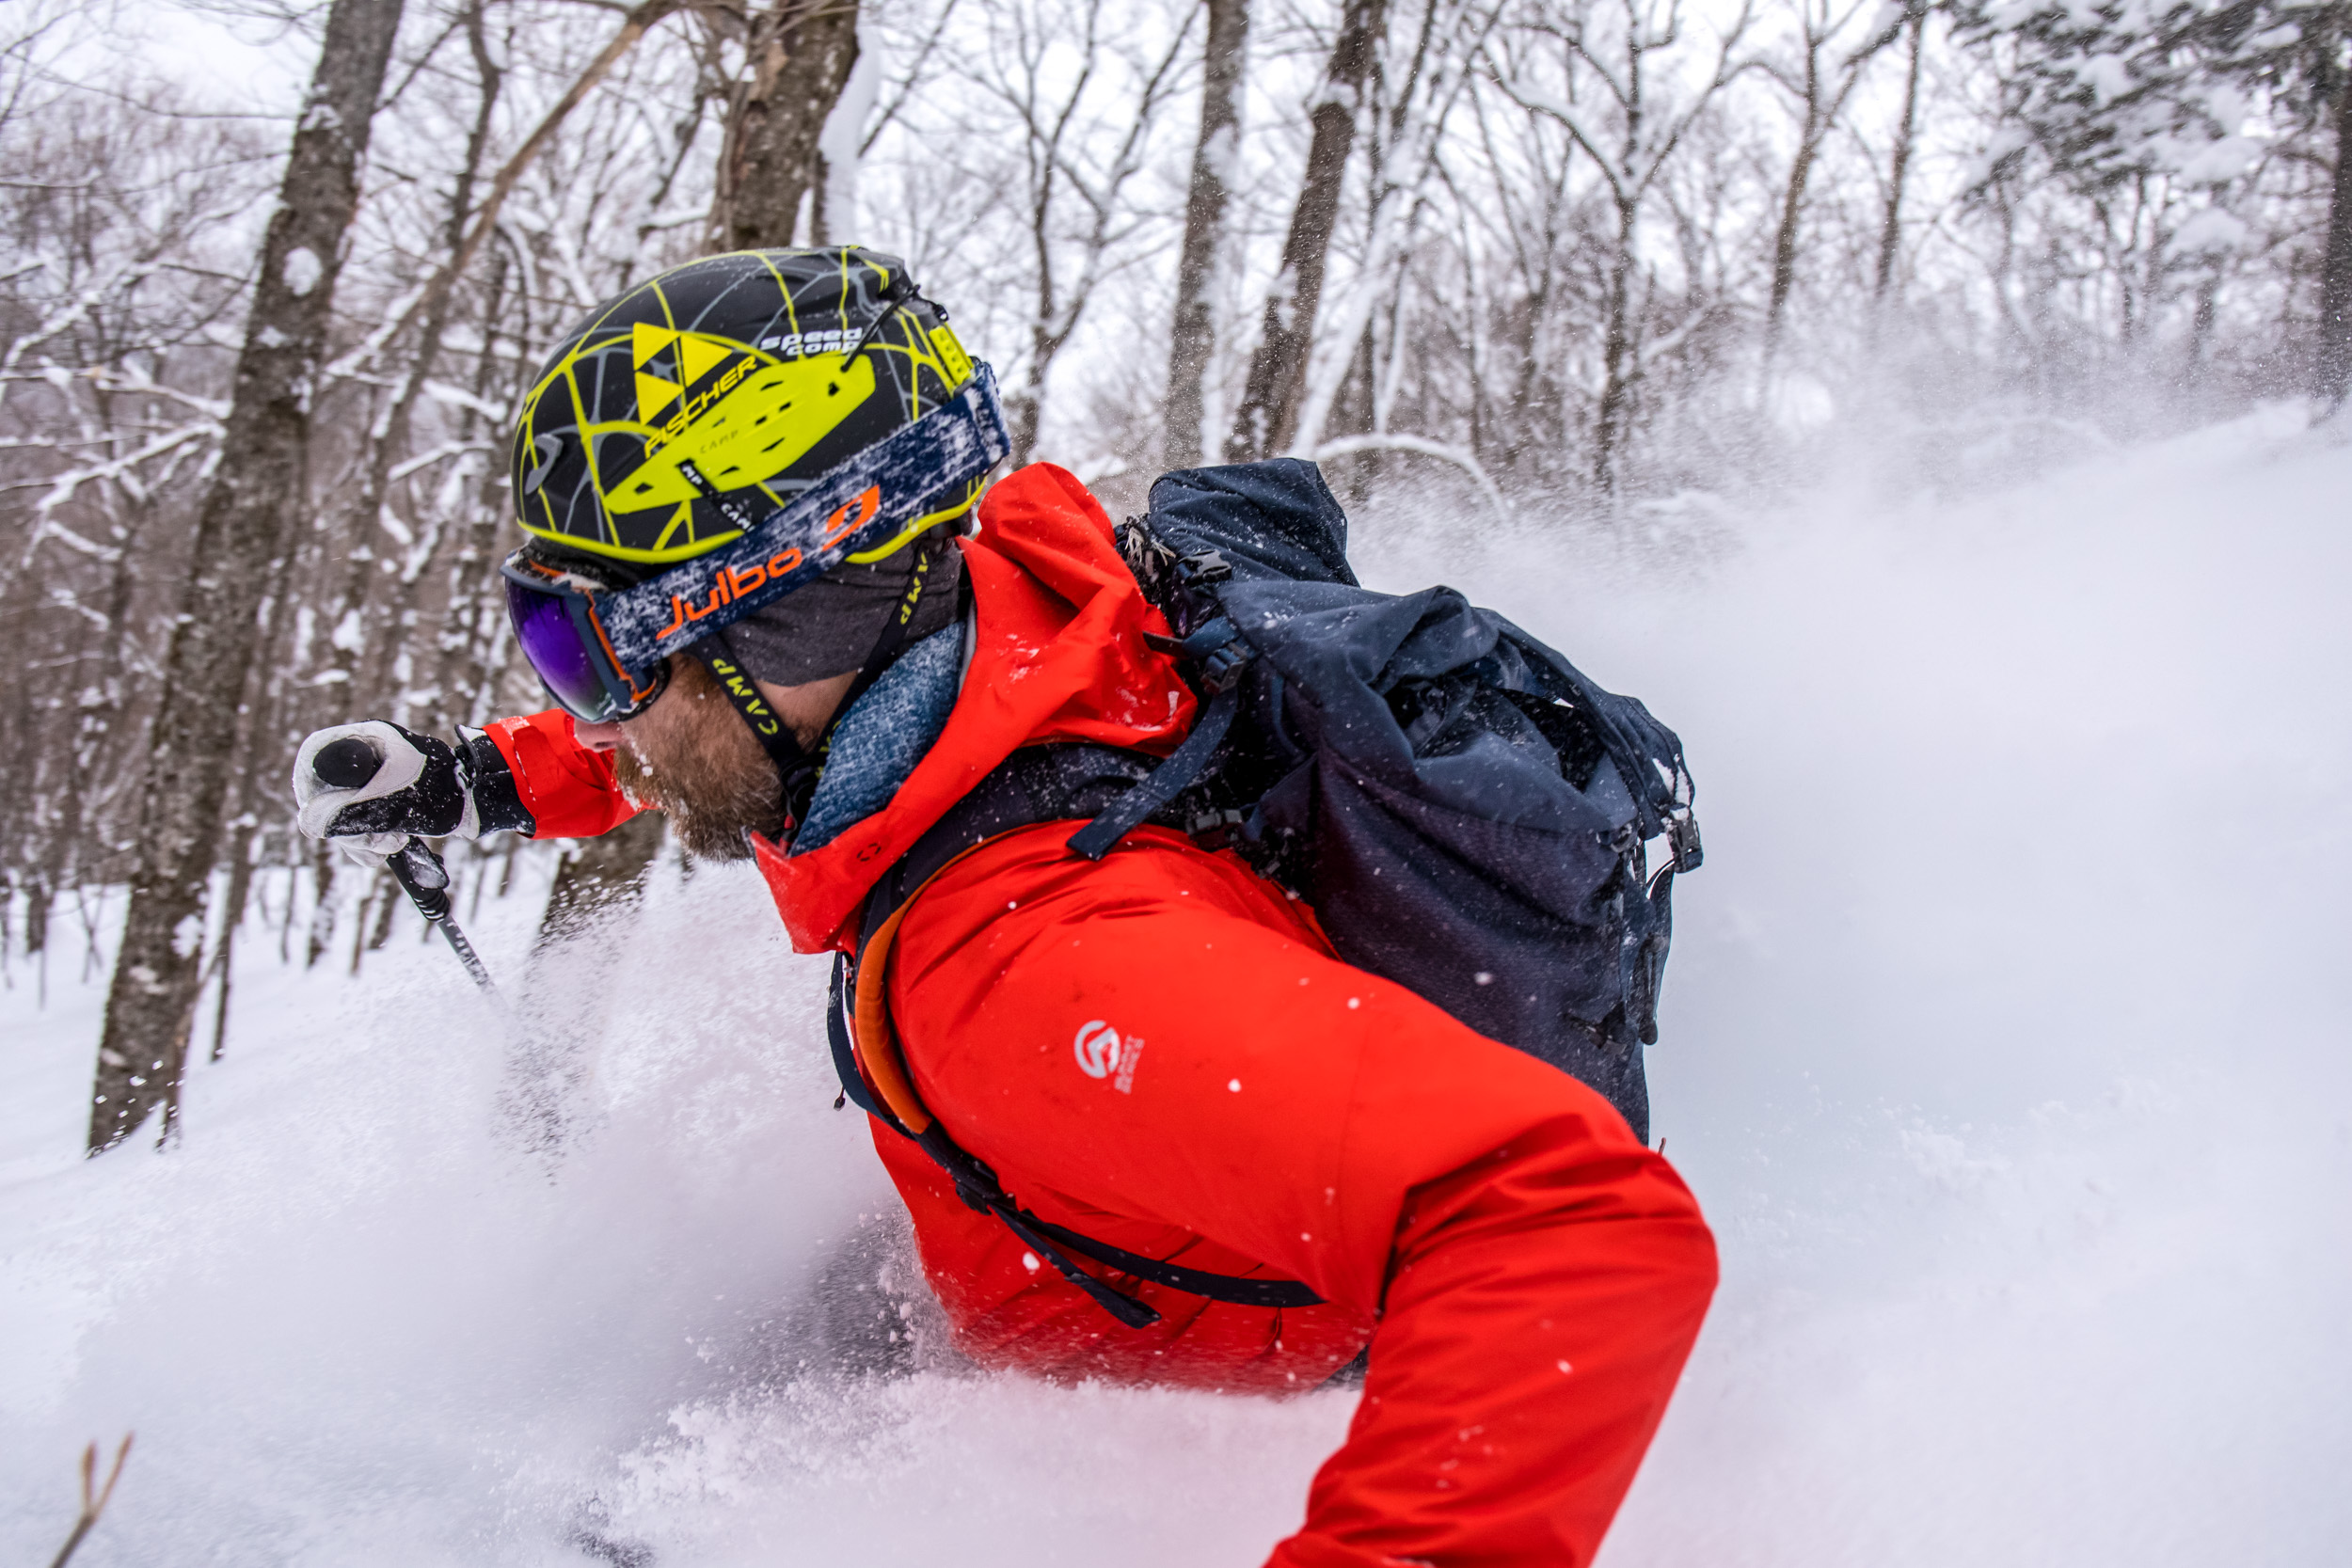 Andrew Drummond Skier White Mountains.jpg